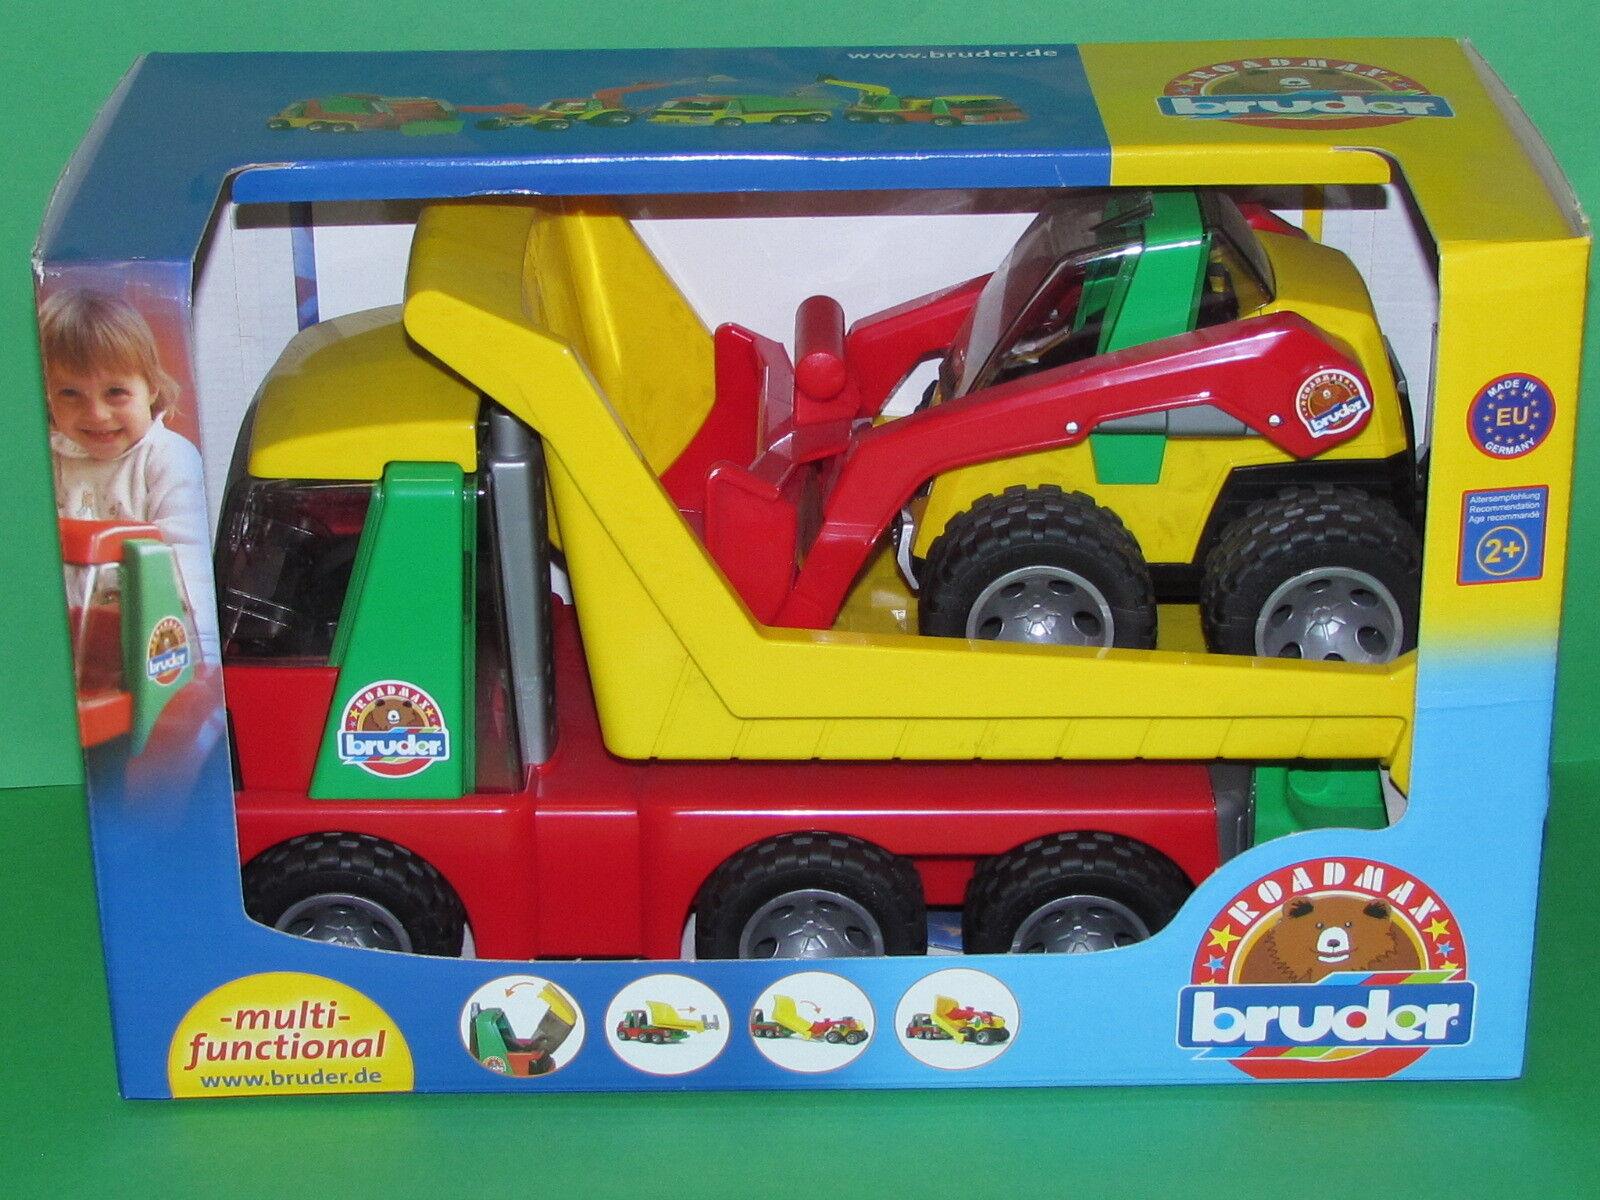 Bruder 20070 20070 20070 Roadmax Transporter mit Kompaktlader Blitzversand per DHL-Paket 5bfde7